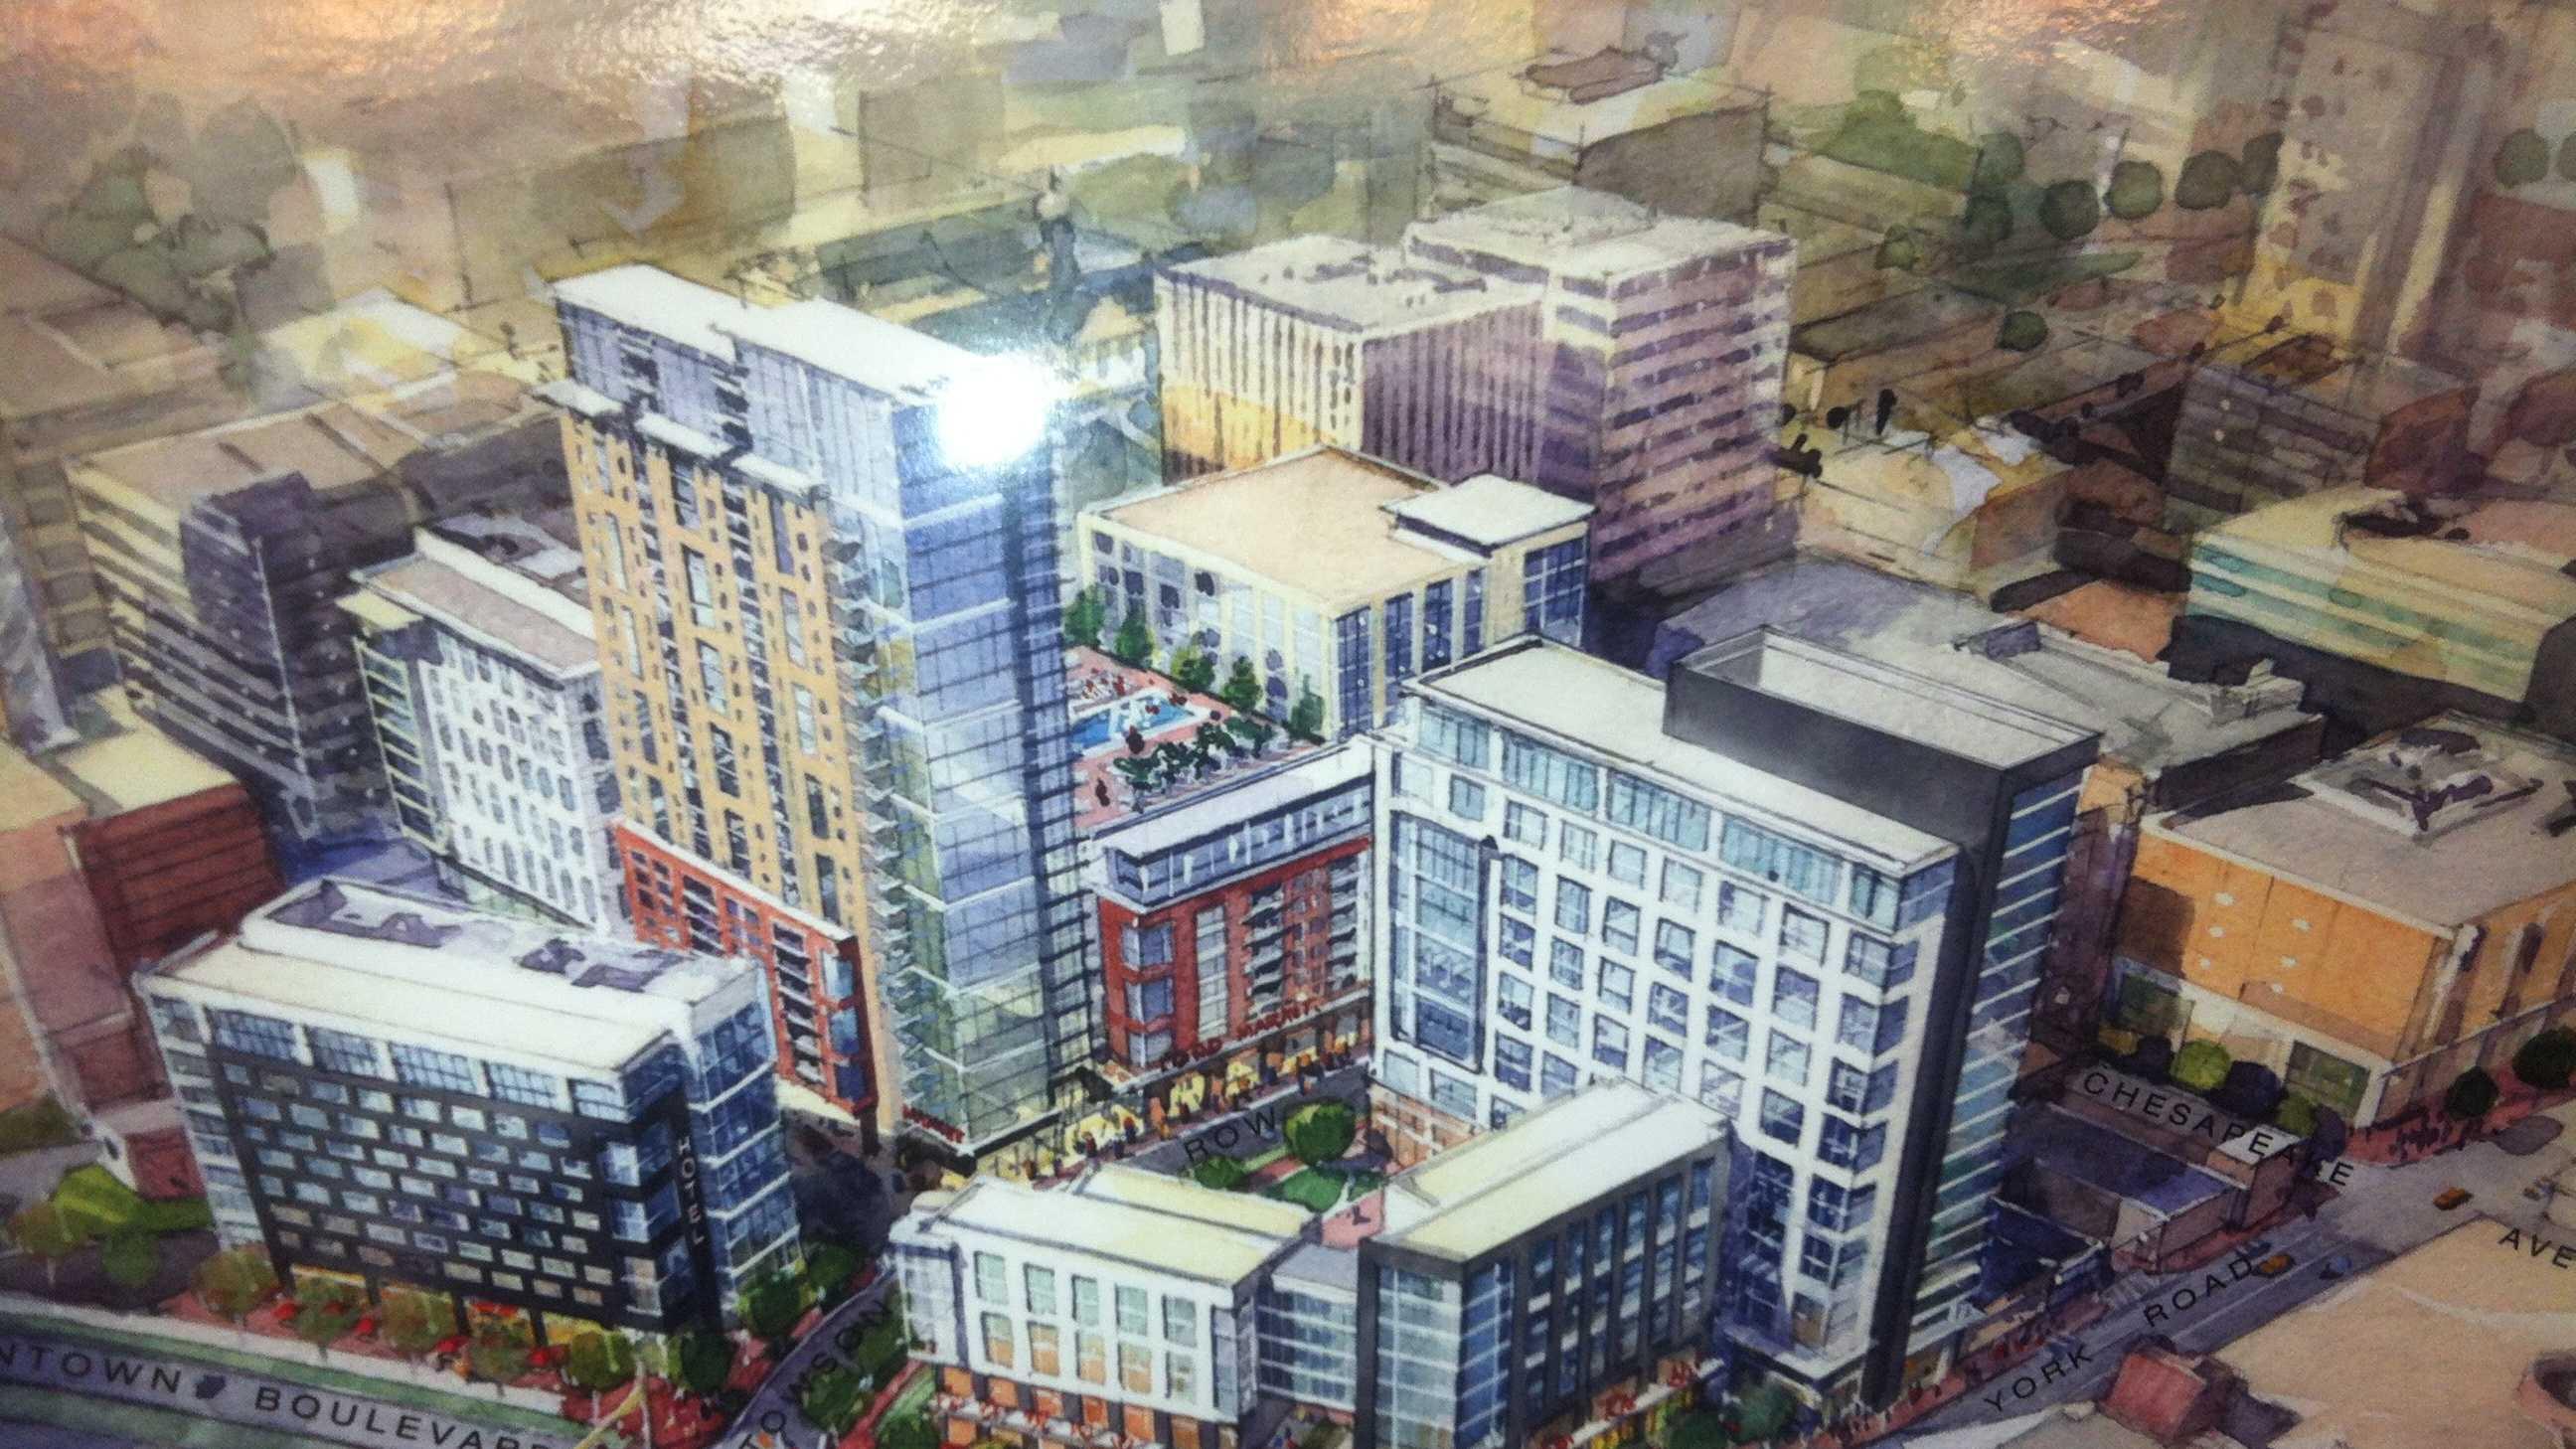 Towson Row development rendering